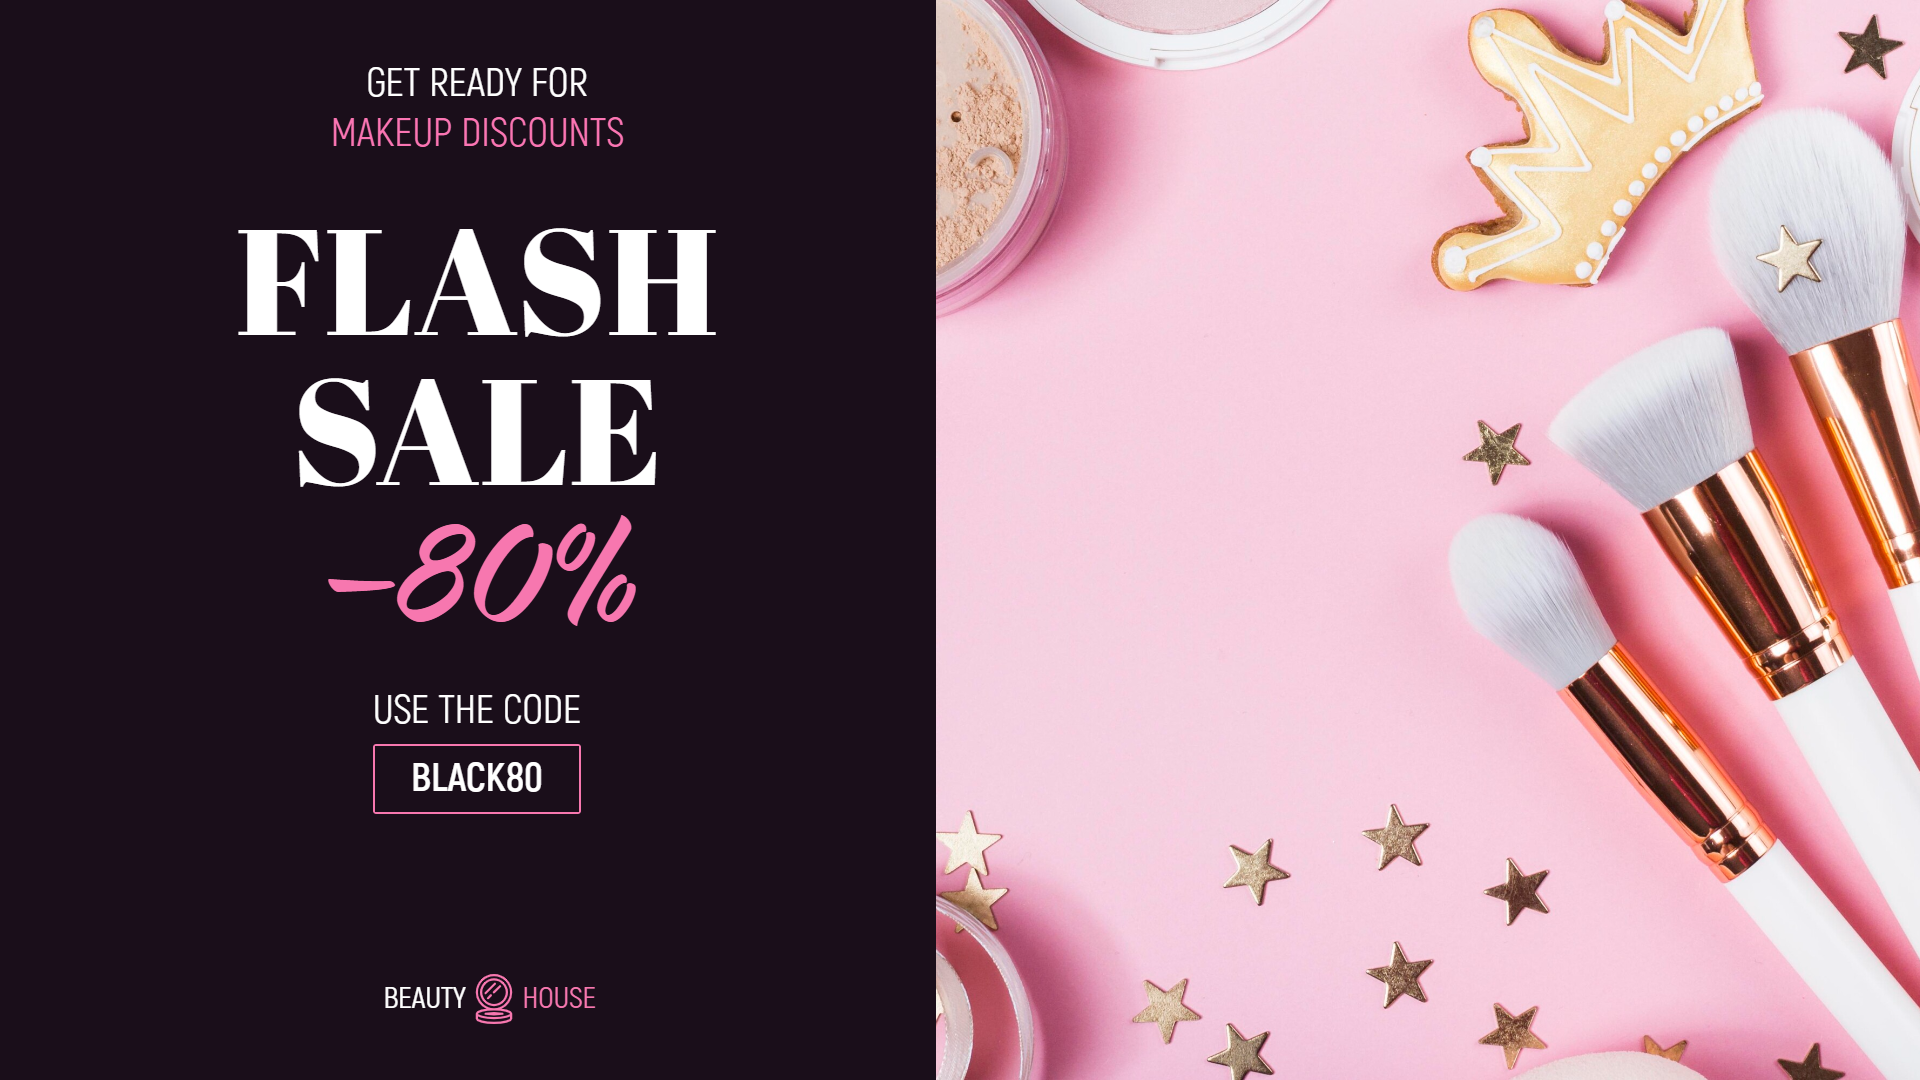 Flash Sale Makeup Banner Design  Template